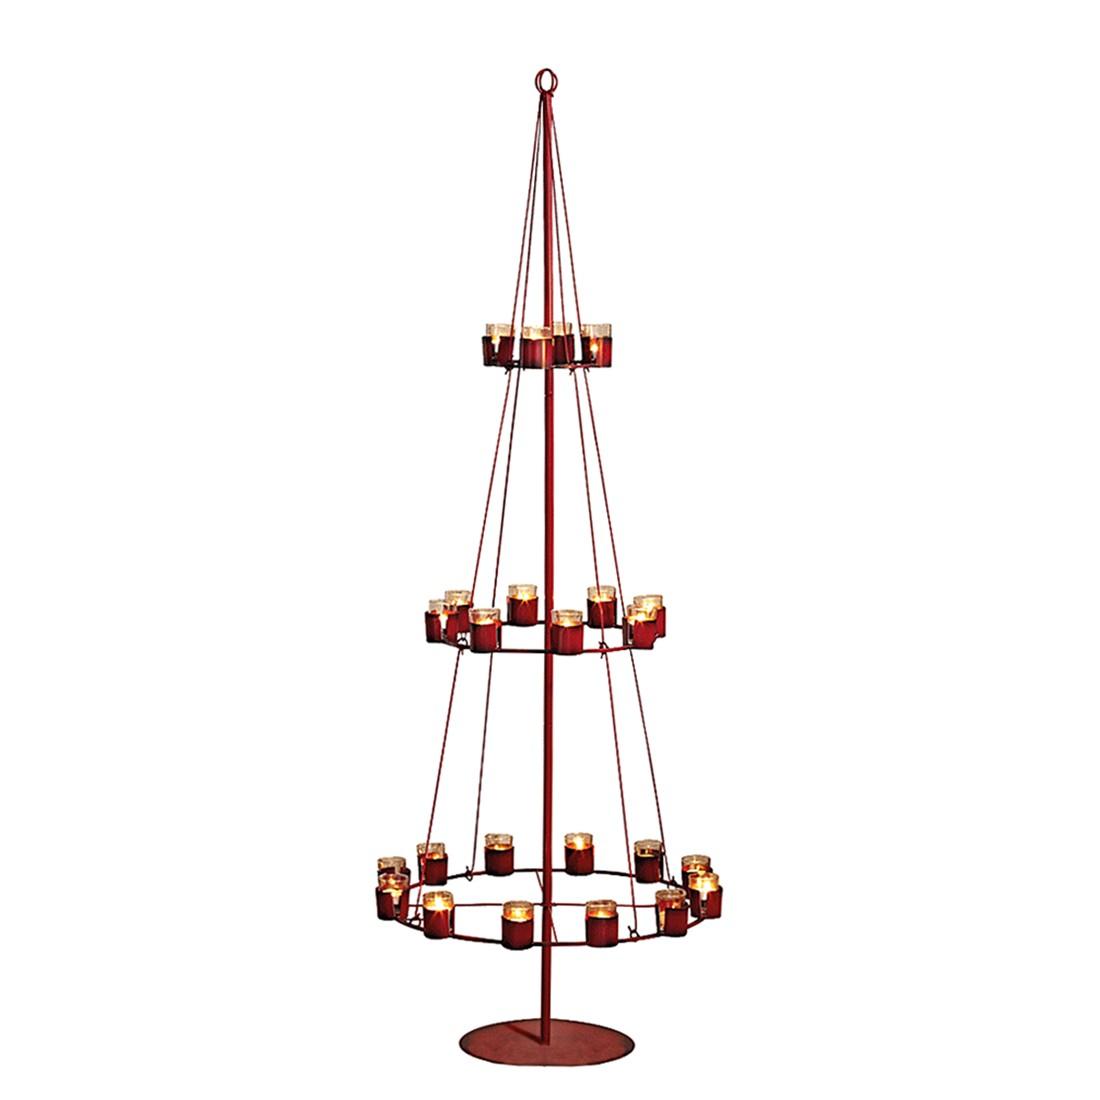 teelichthalter christbaum metall glas rot pureday. Black Bedroom Furniture Sets. Home Design Ideas